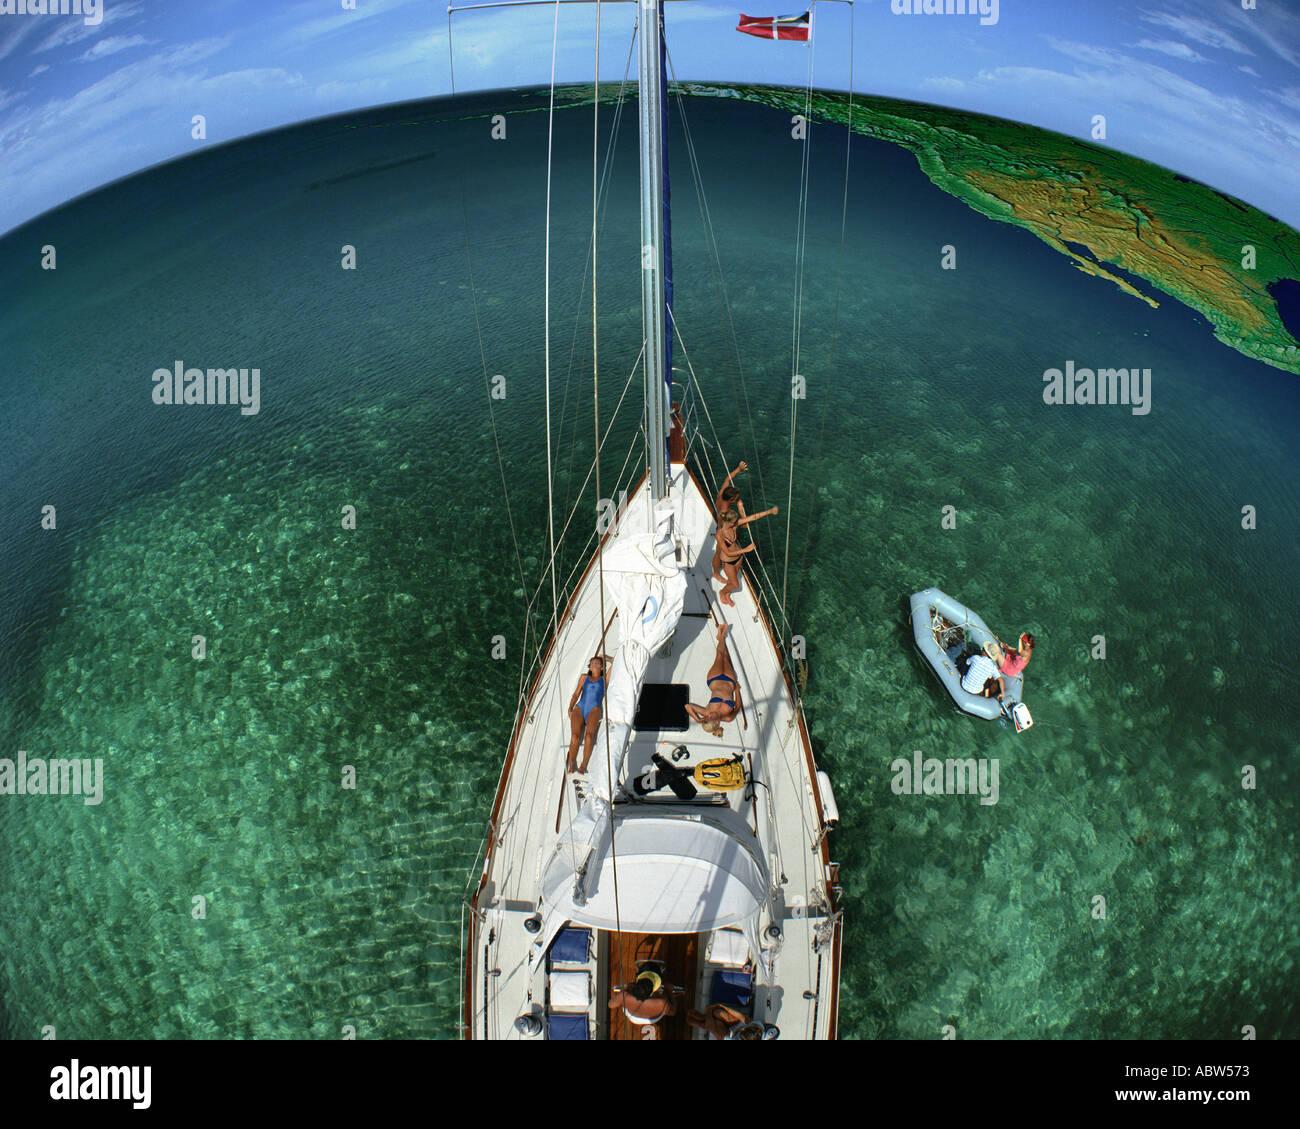 BH - THE BAHAMAS: Sailing the World Stock Photo